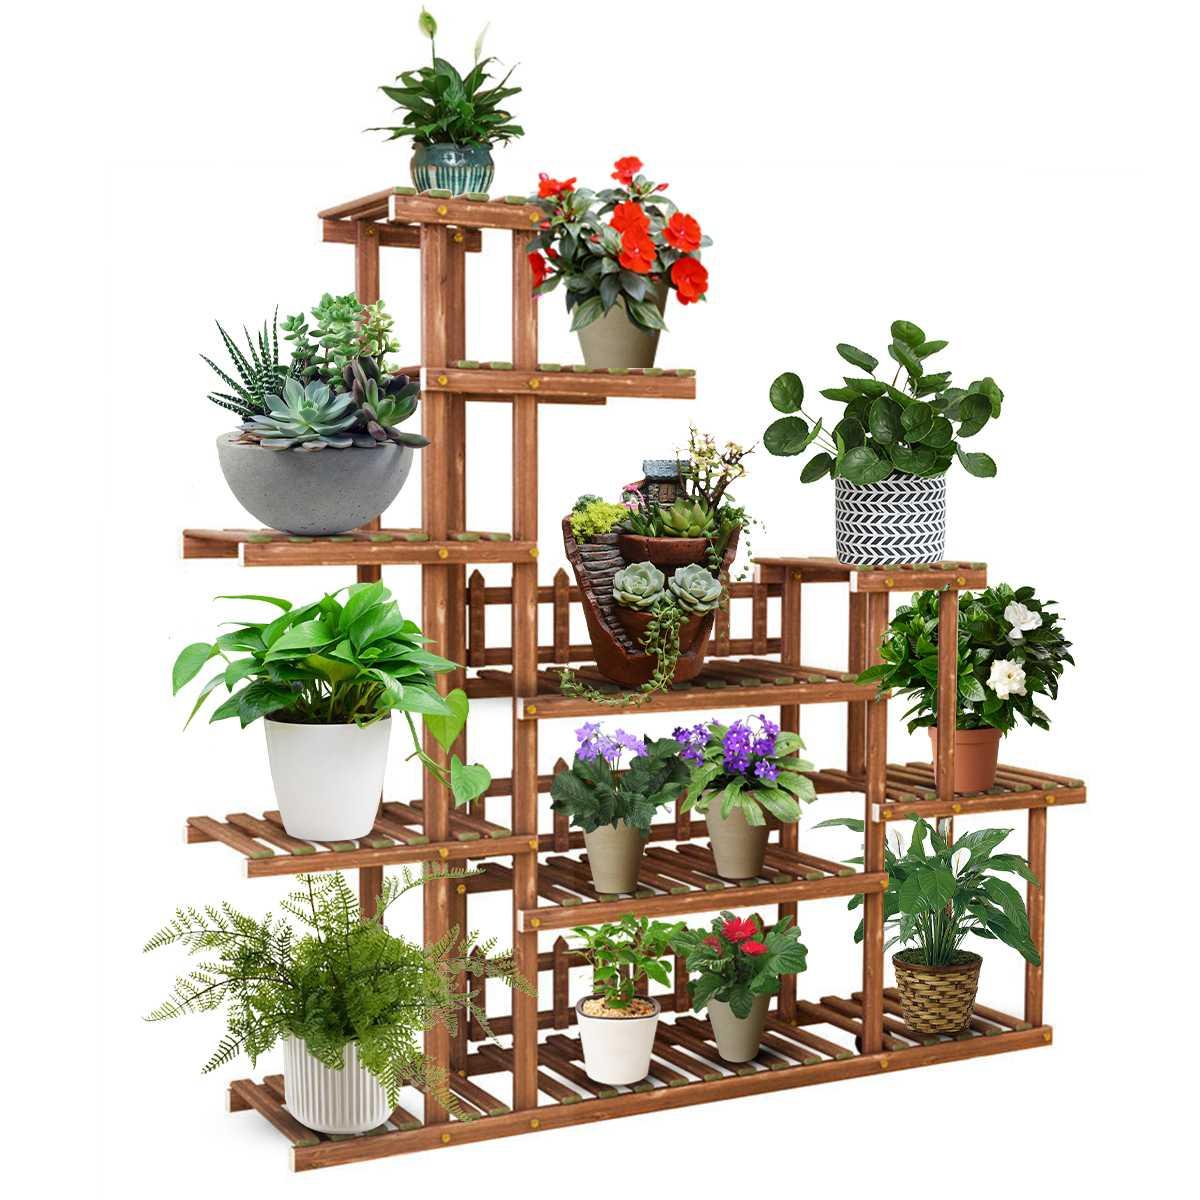 5 Tiers Multi Tier Flower Plant Holder Stand Rack Wood Shelves balcony flower rack Plant stand Garden Bonsai Display Shelf